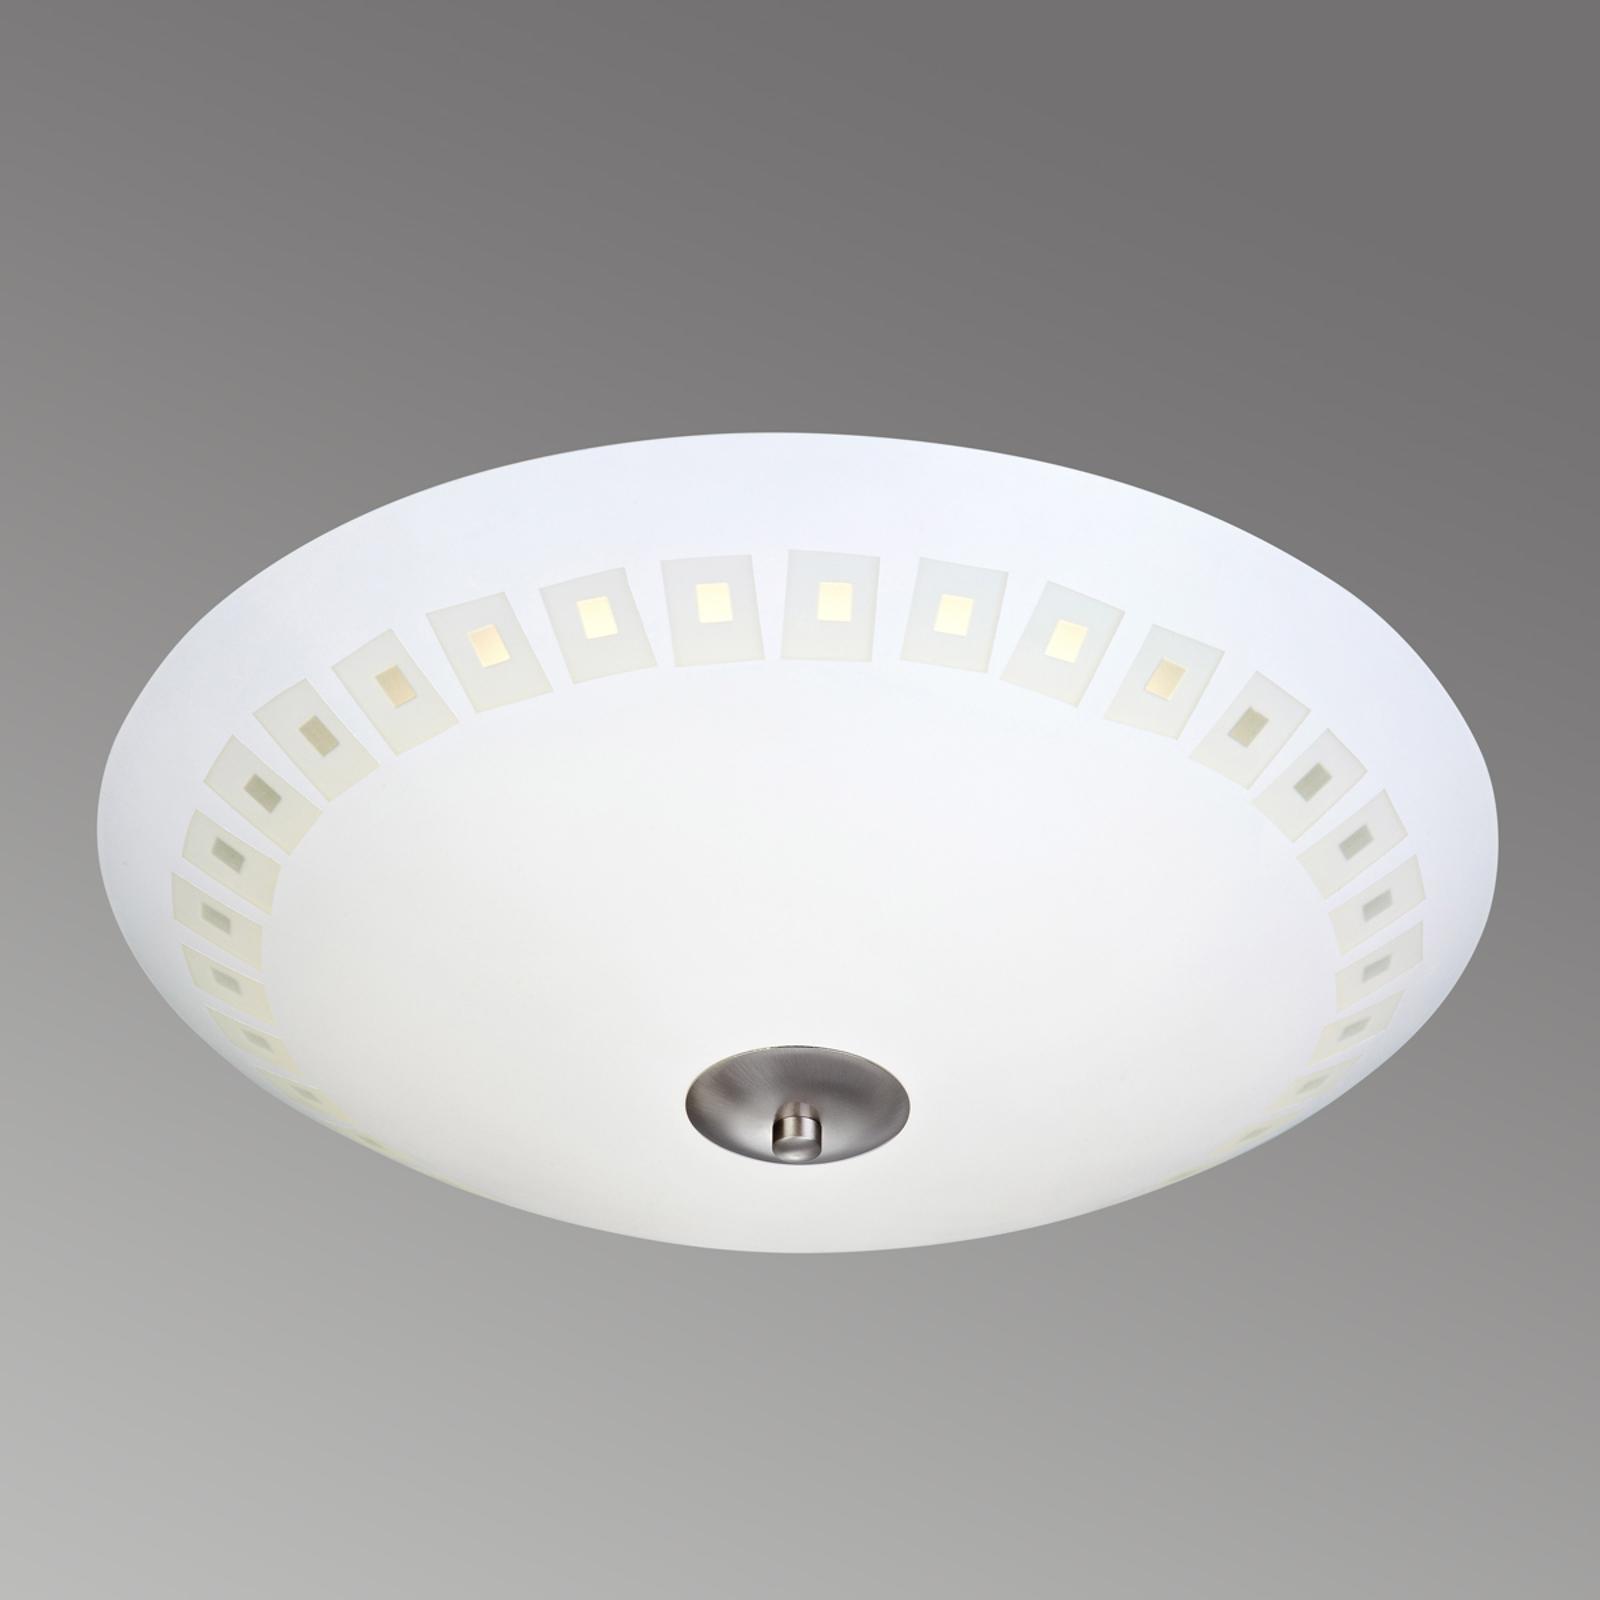 LED plafondlamp Adria